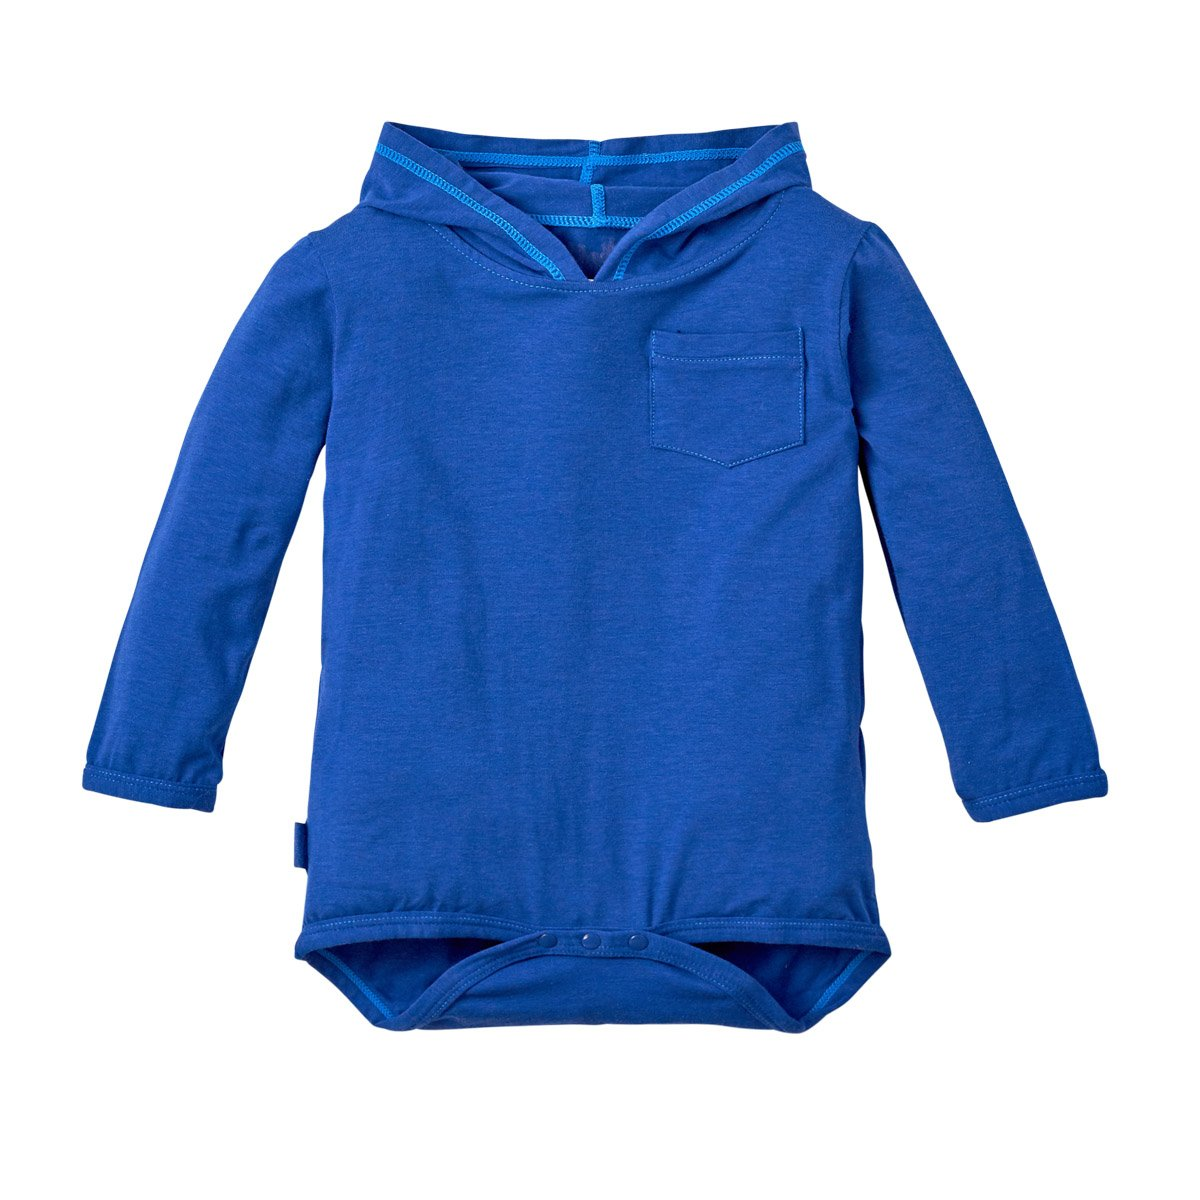 UV SKINZ Hooded Sunzie-Navy Blue 12/24 Months UPF 50+